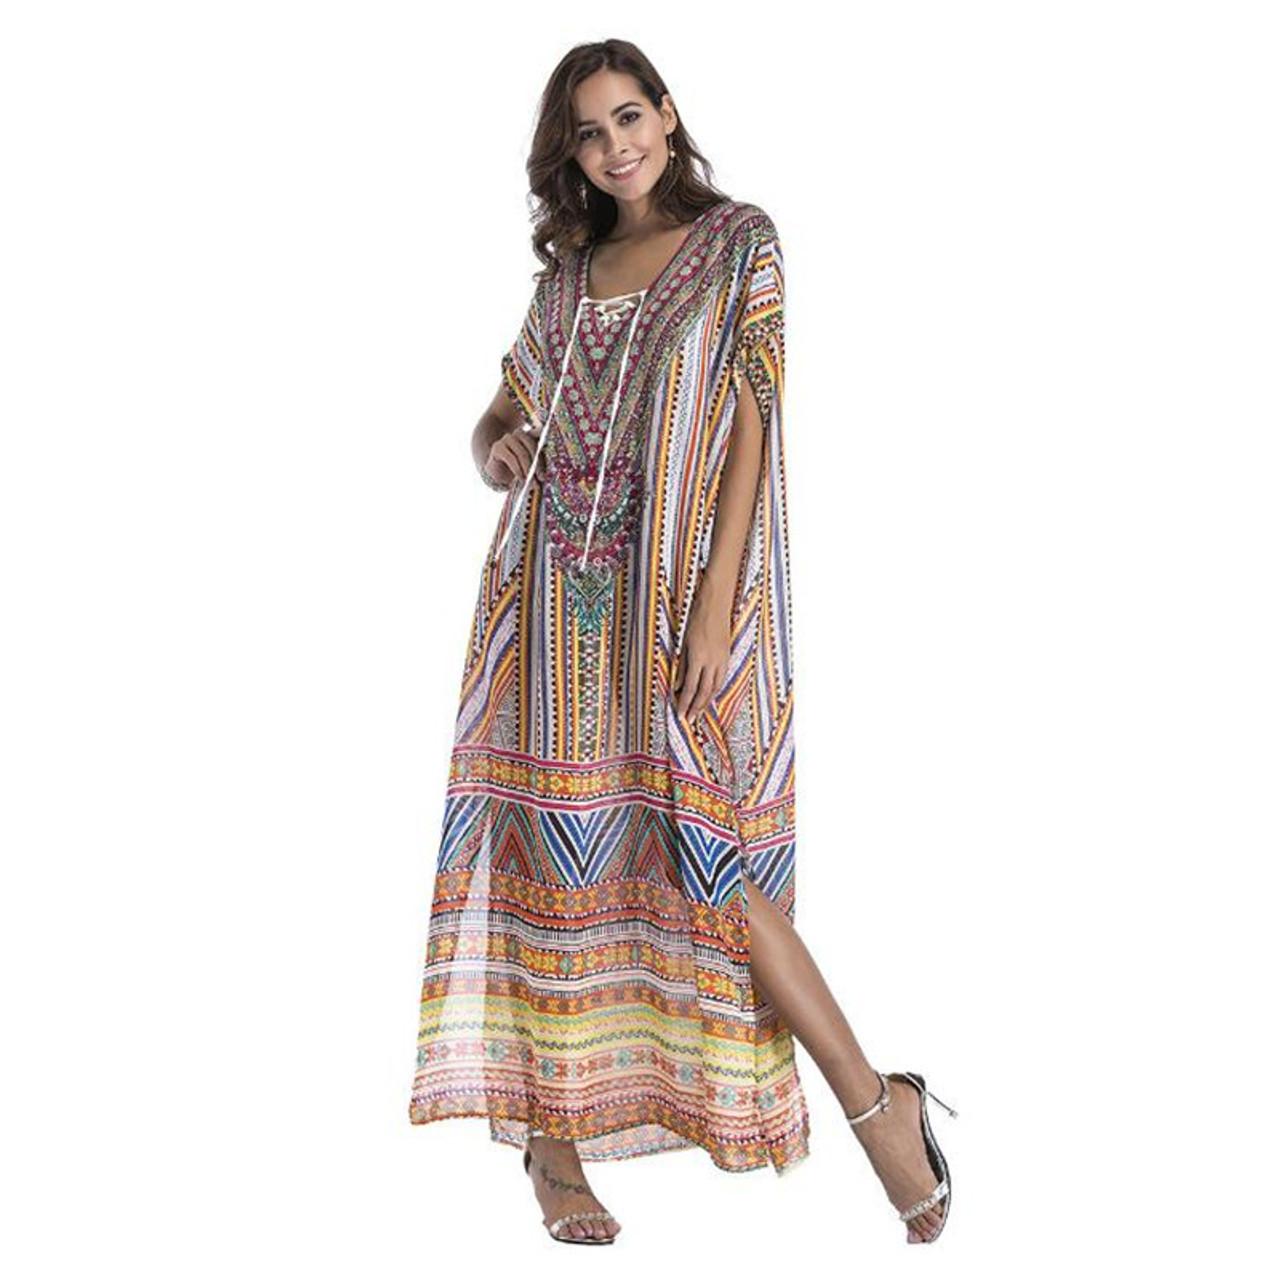 1db076eafadd8 Chiffon fashion print Bohemian long maxi dress boho clothing 2019 summer  sundress Beach Sarongs large size robes women